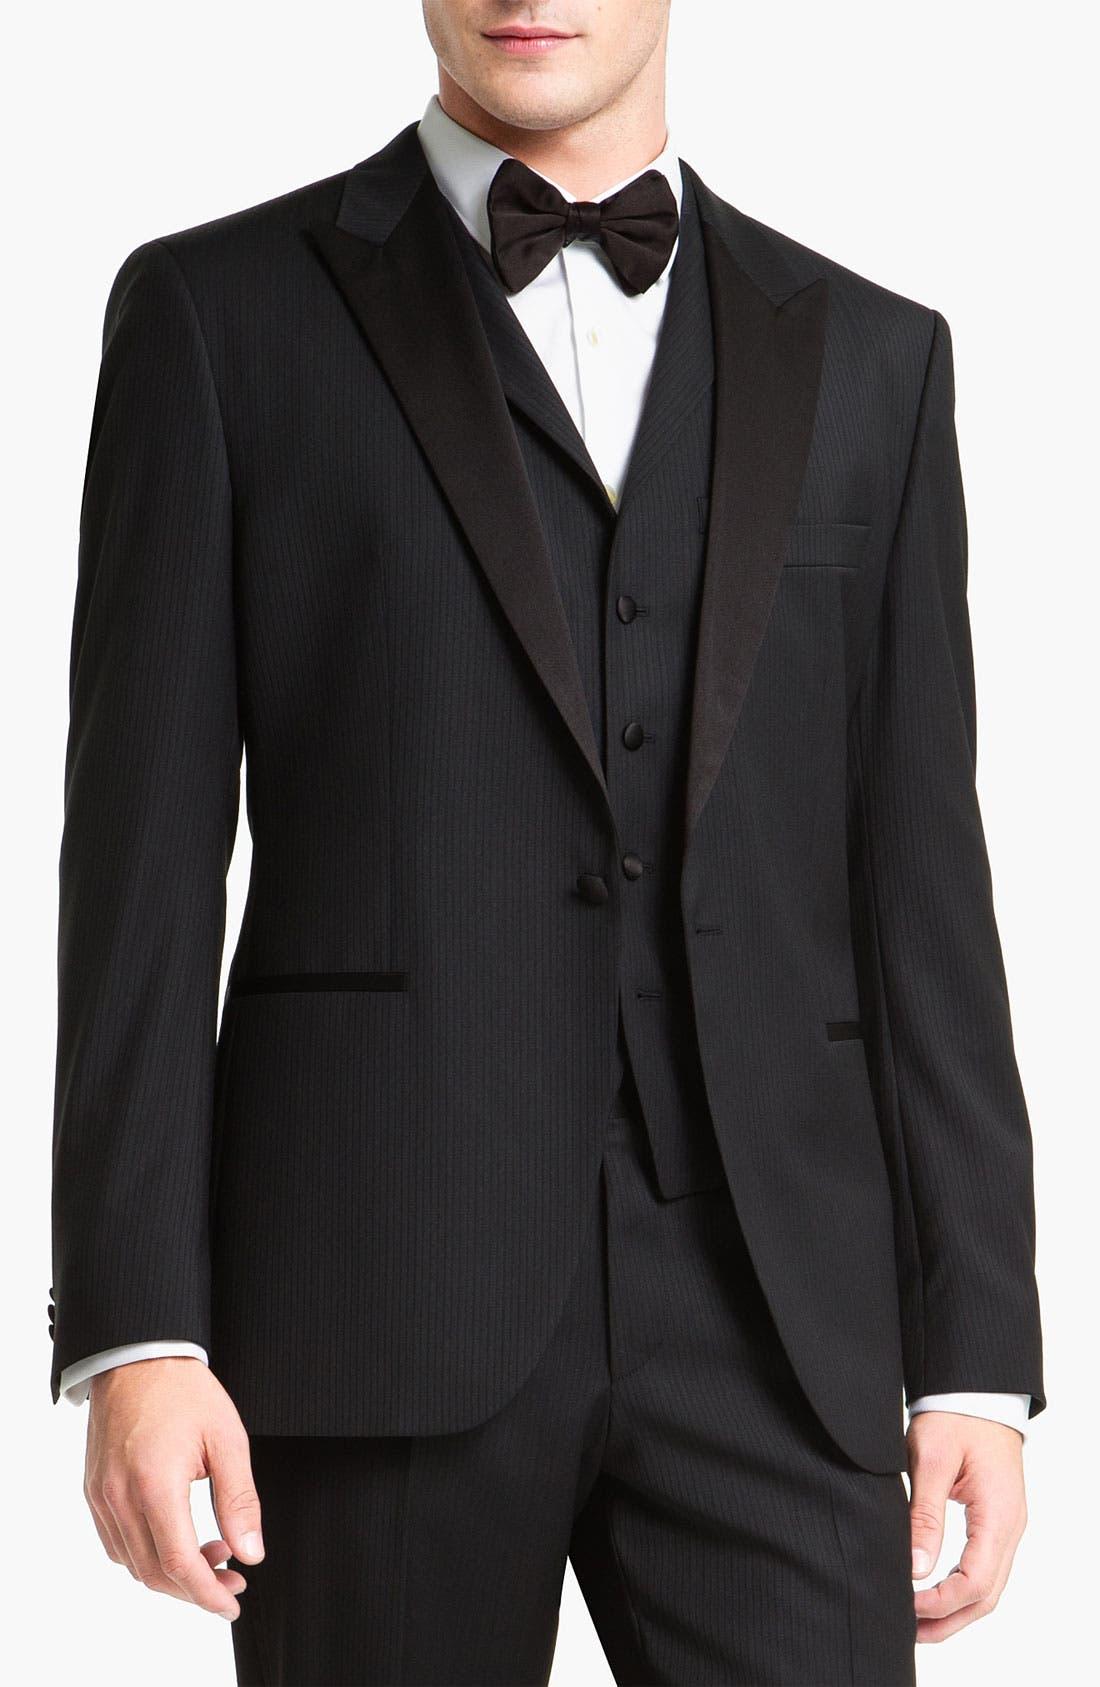 Alternate Image 1 Selected - BOSS Black 'The Joy/Gala' Trim Fit Stripe Tuxedo